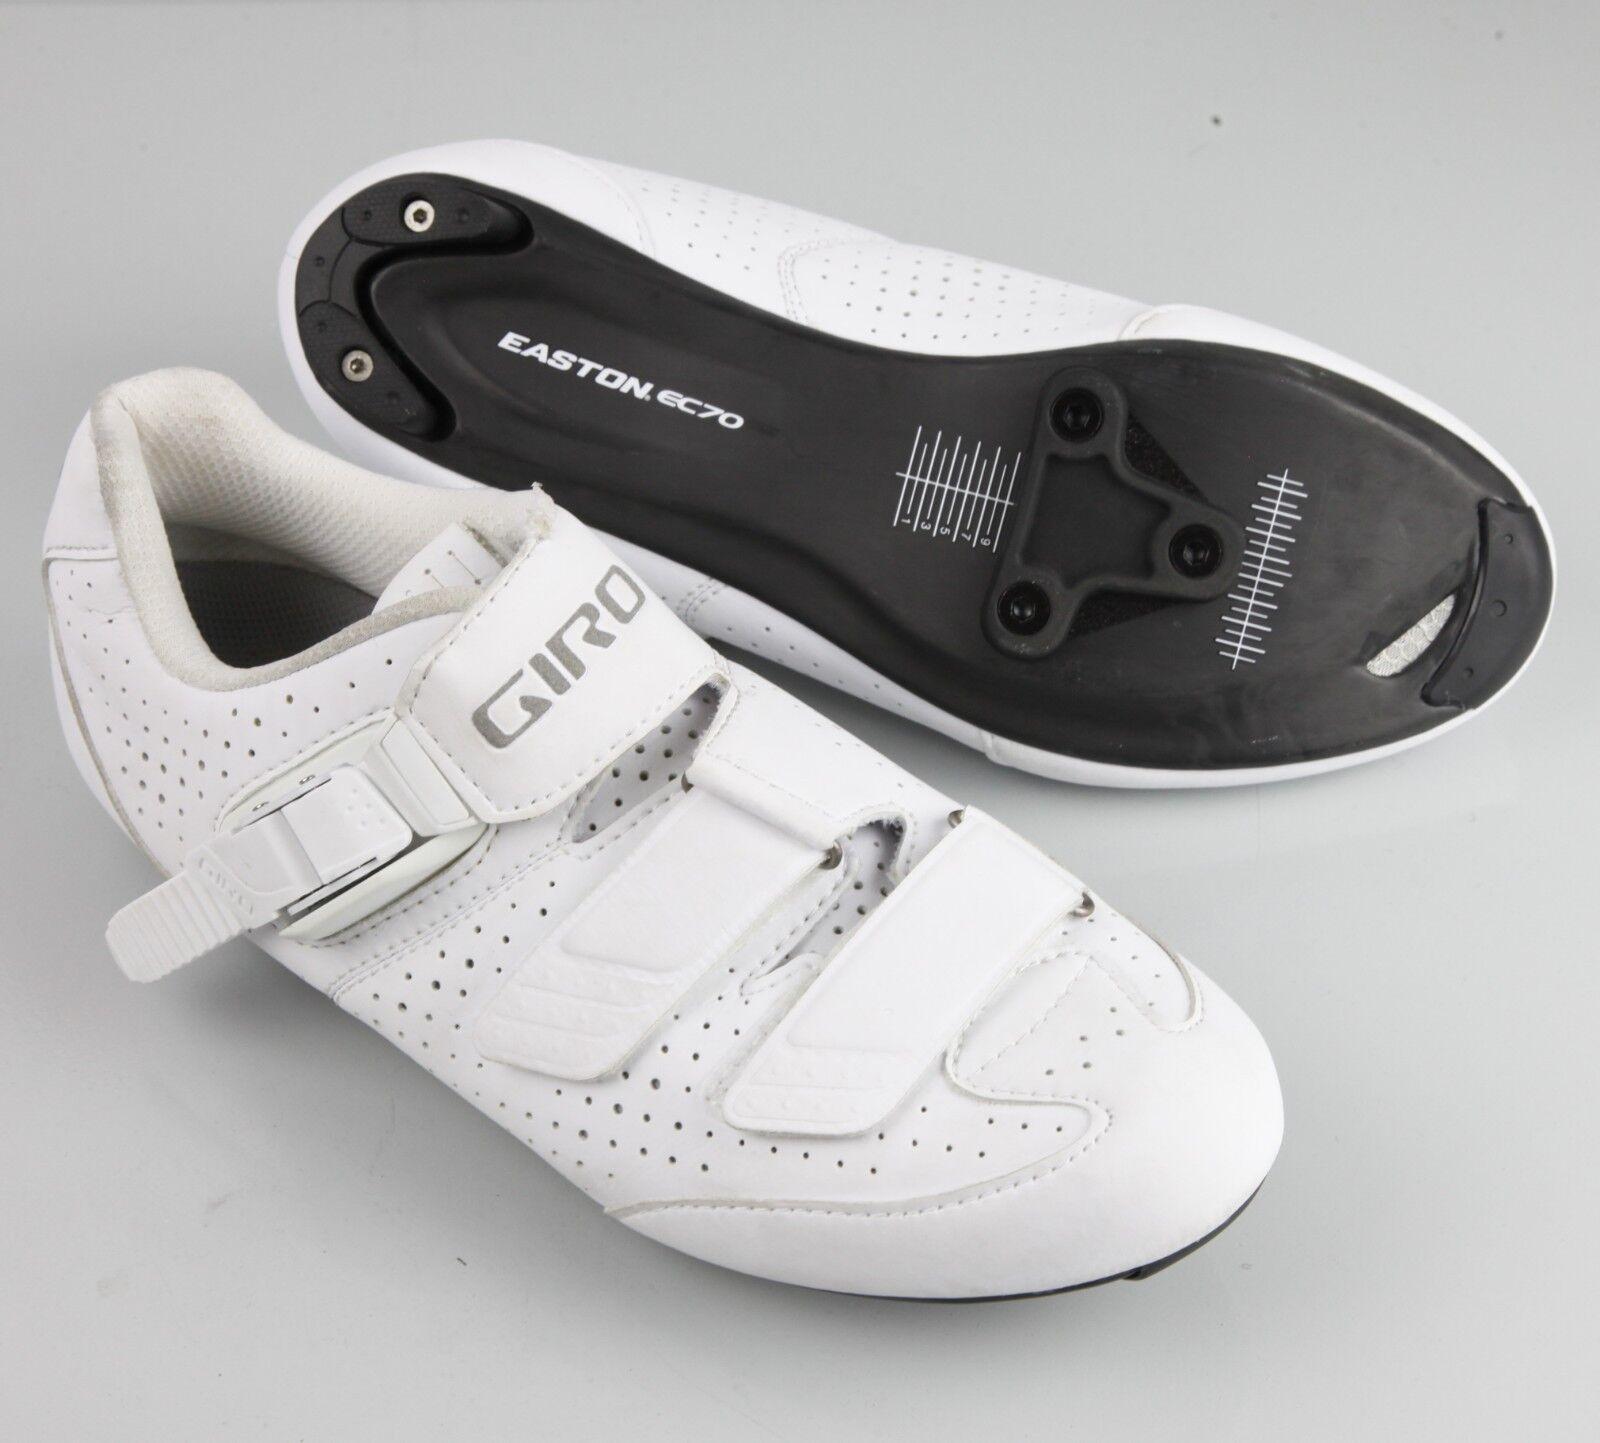 GIRO Espada E70 damen Road Cycling schuhe - Weiß - Größe EU 41, US 9